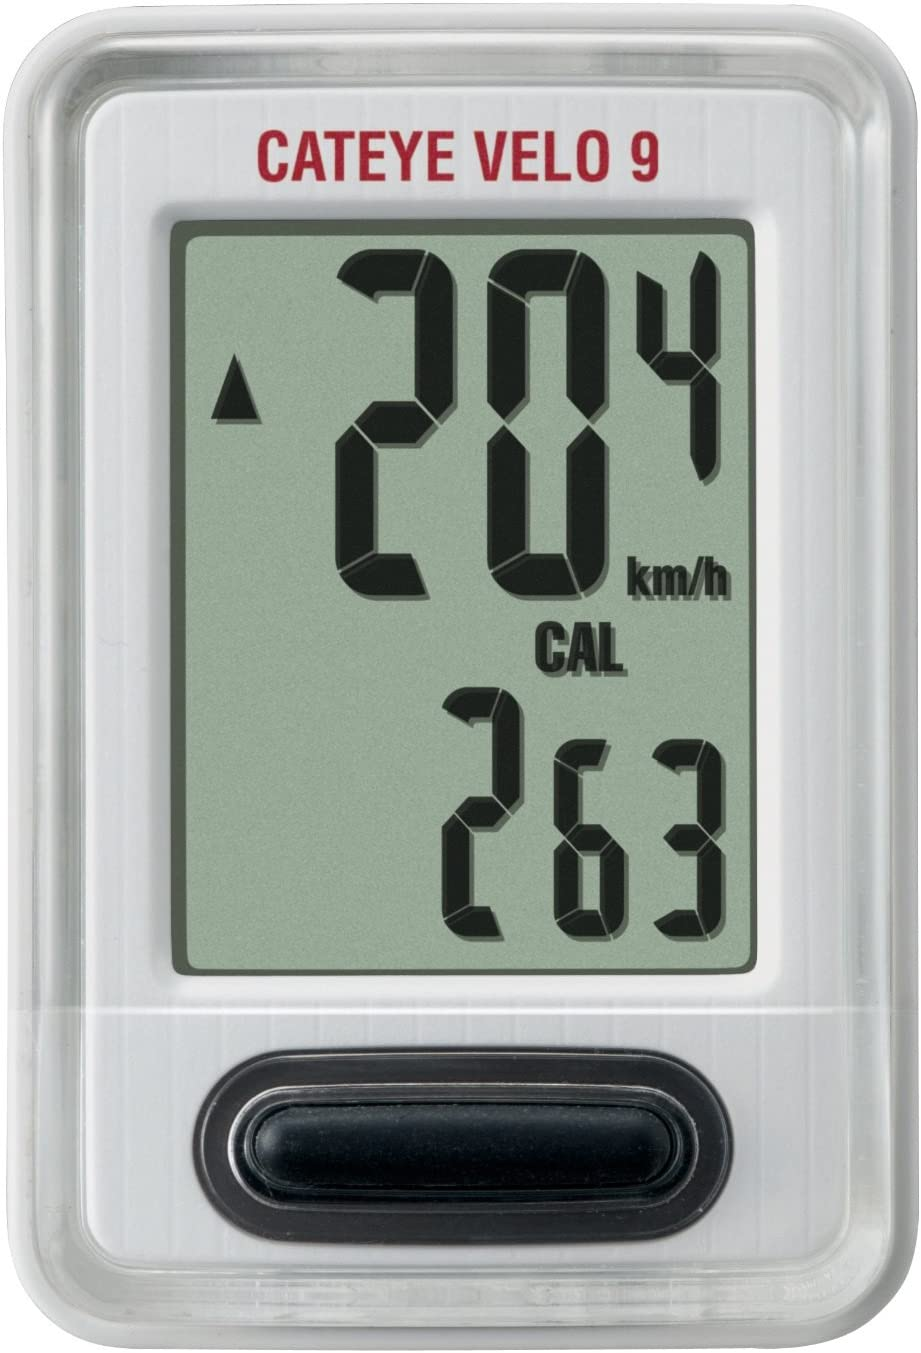 CatEye CTVL820W - Computadora Velo 9 Blanca